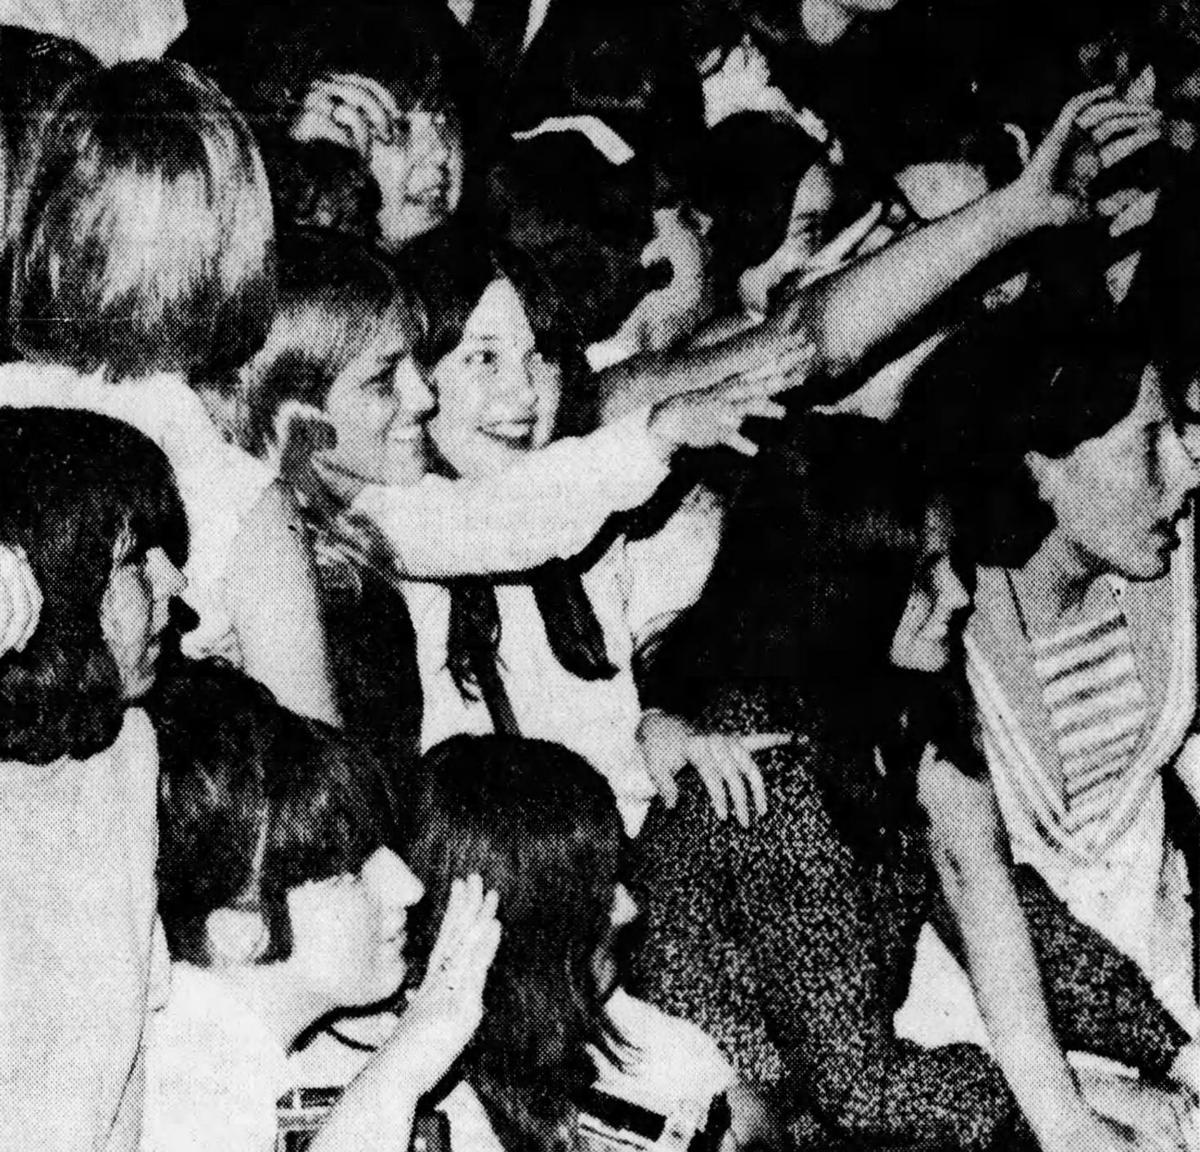 1966 Rolling Stones